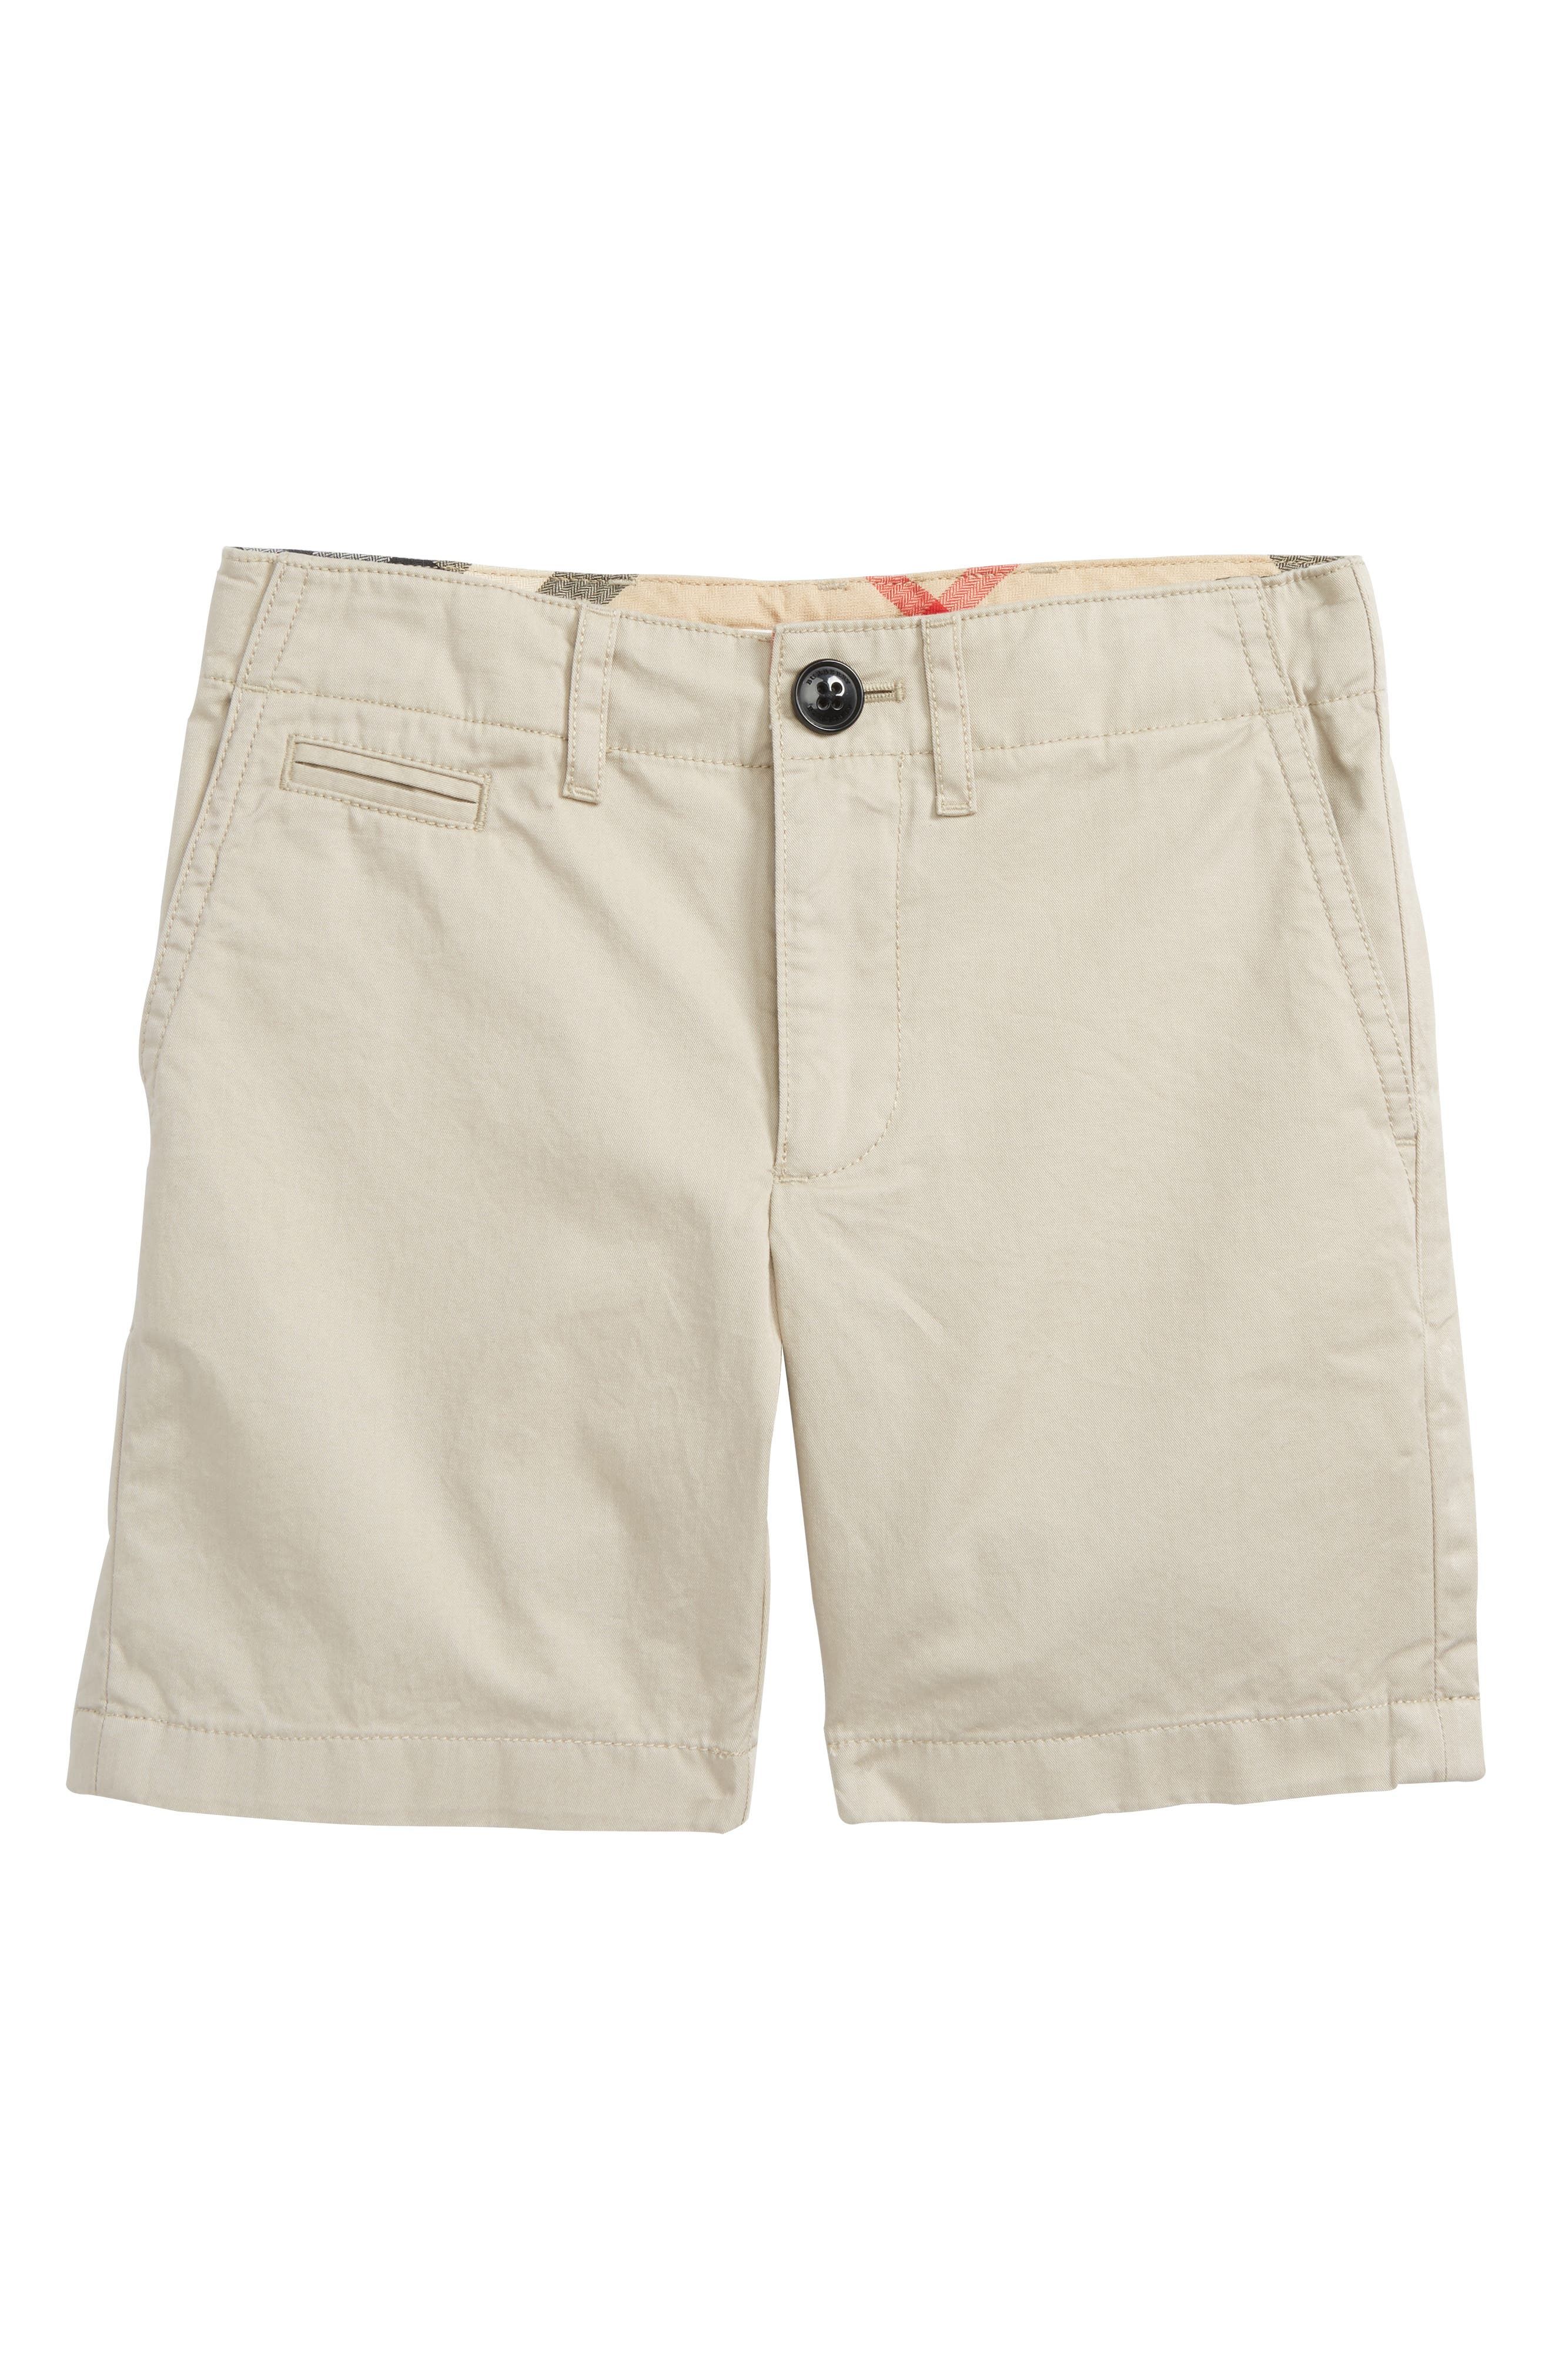 Tristen Shorts,                         Main,                         color, Grey Stone